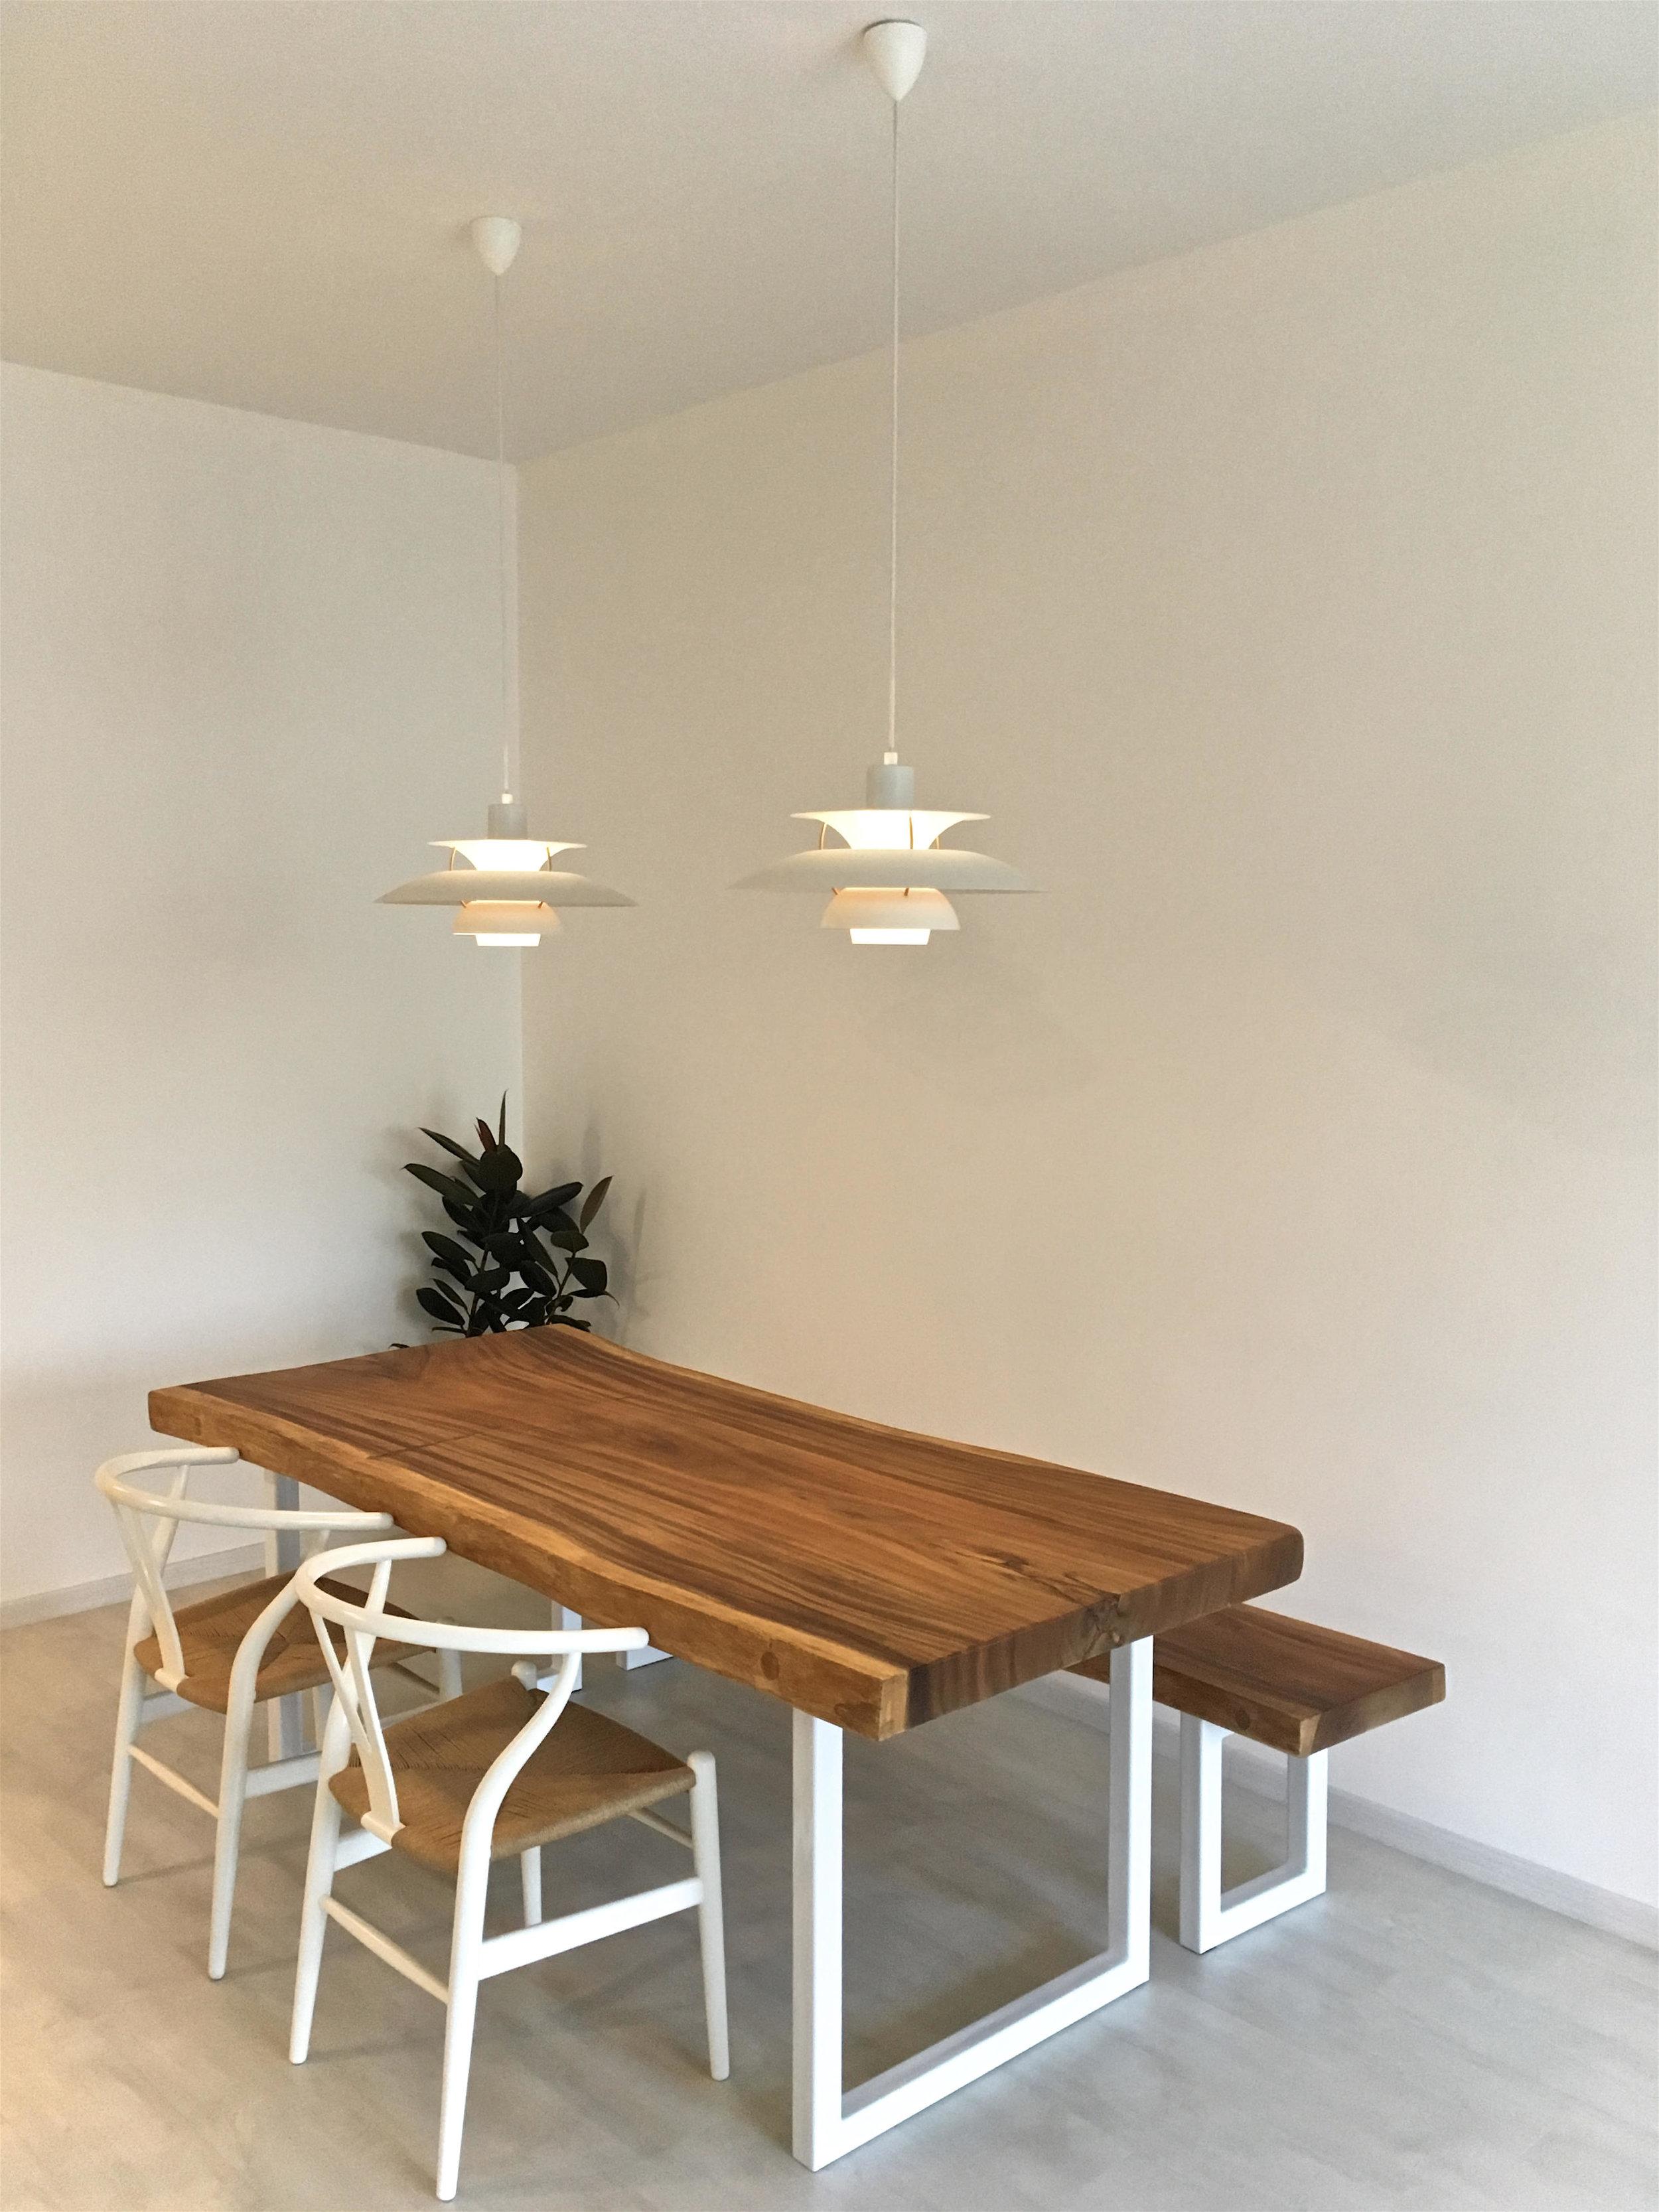 Suar Wood Custom Legs and Custom Bench // Herman Furniture Singapore